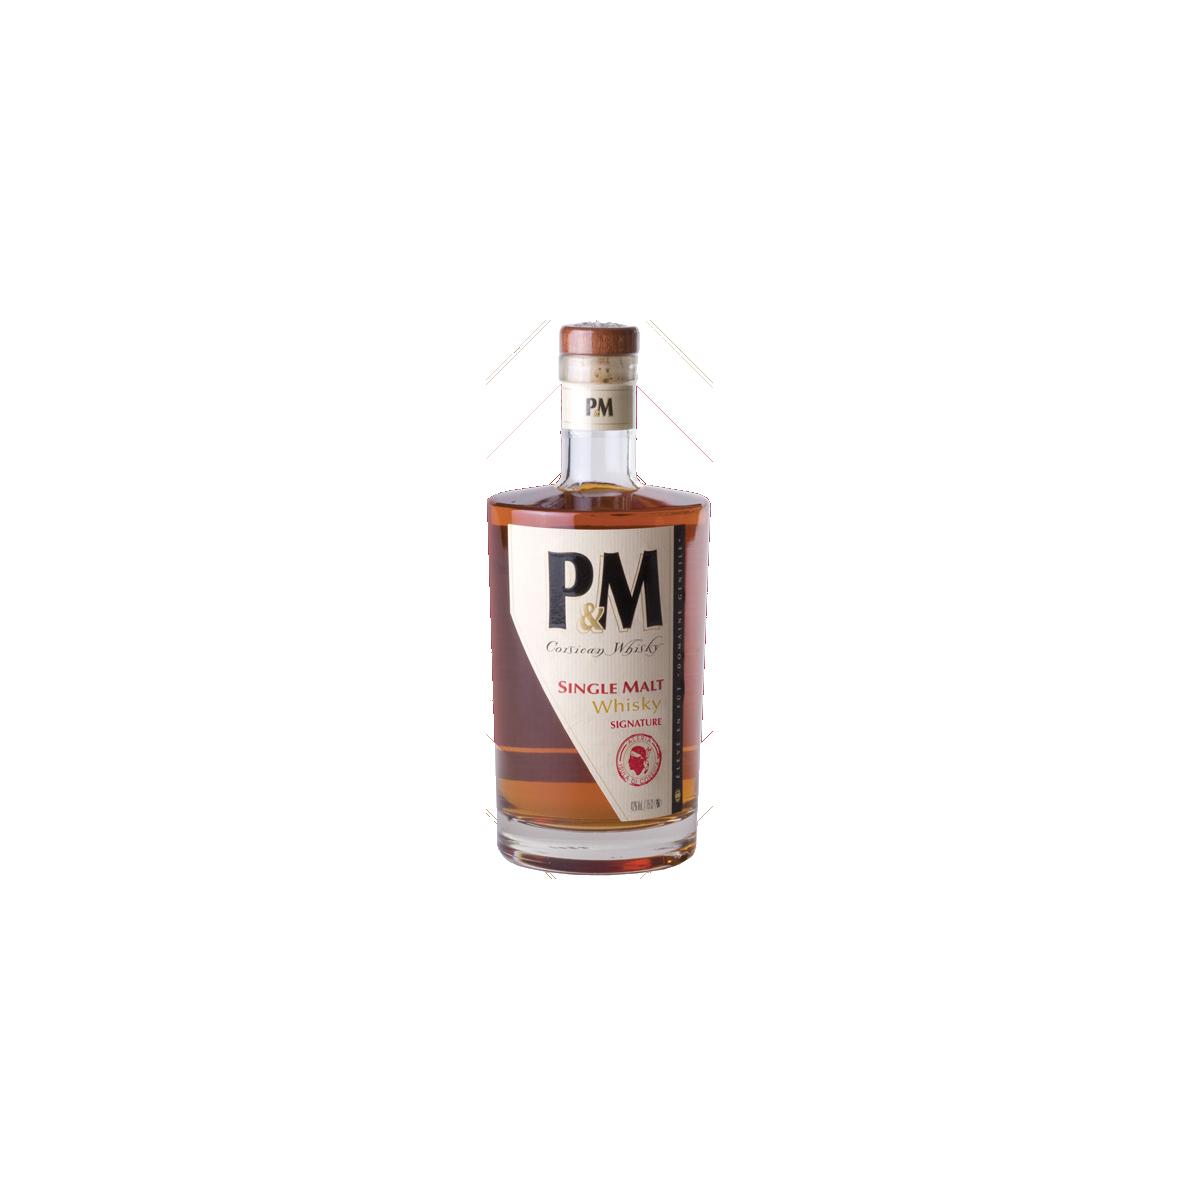 P&M Single Malt Signature Whisky 42%